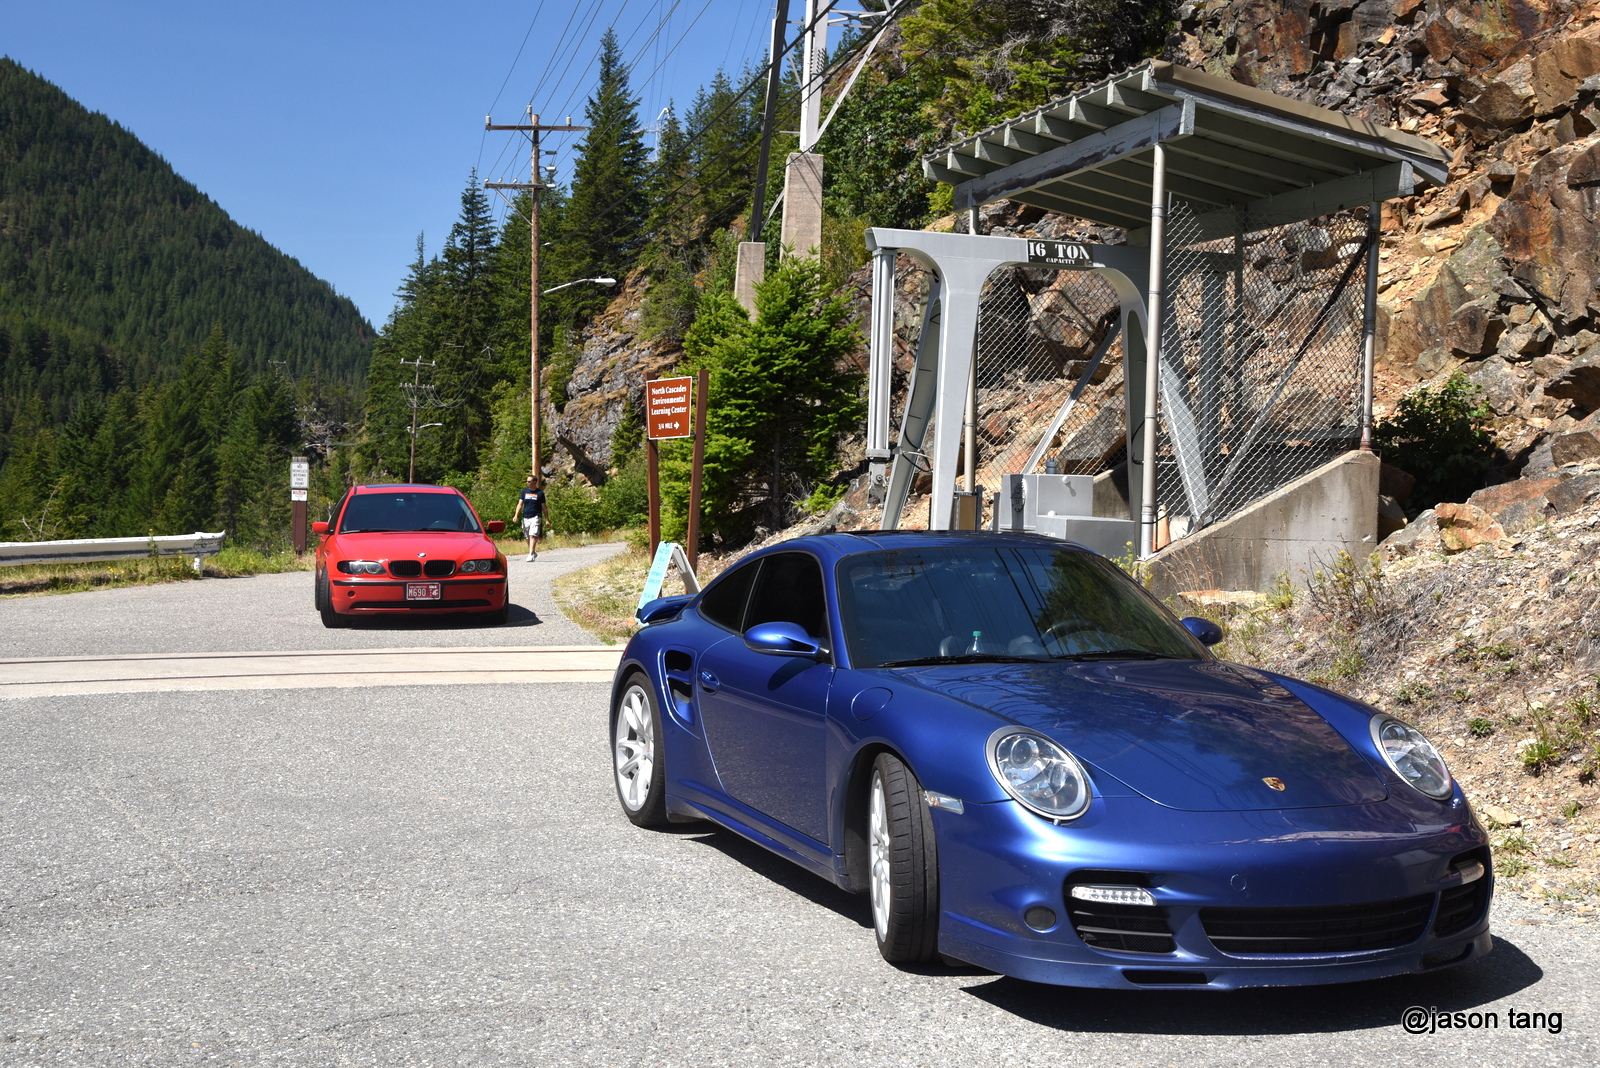 Summer Drive over Highway 20_43390317692_o.jpg